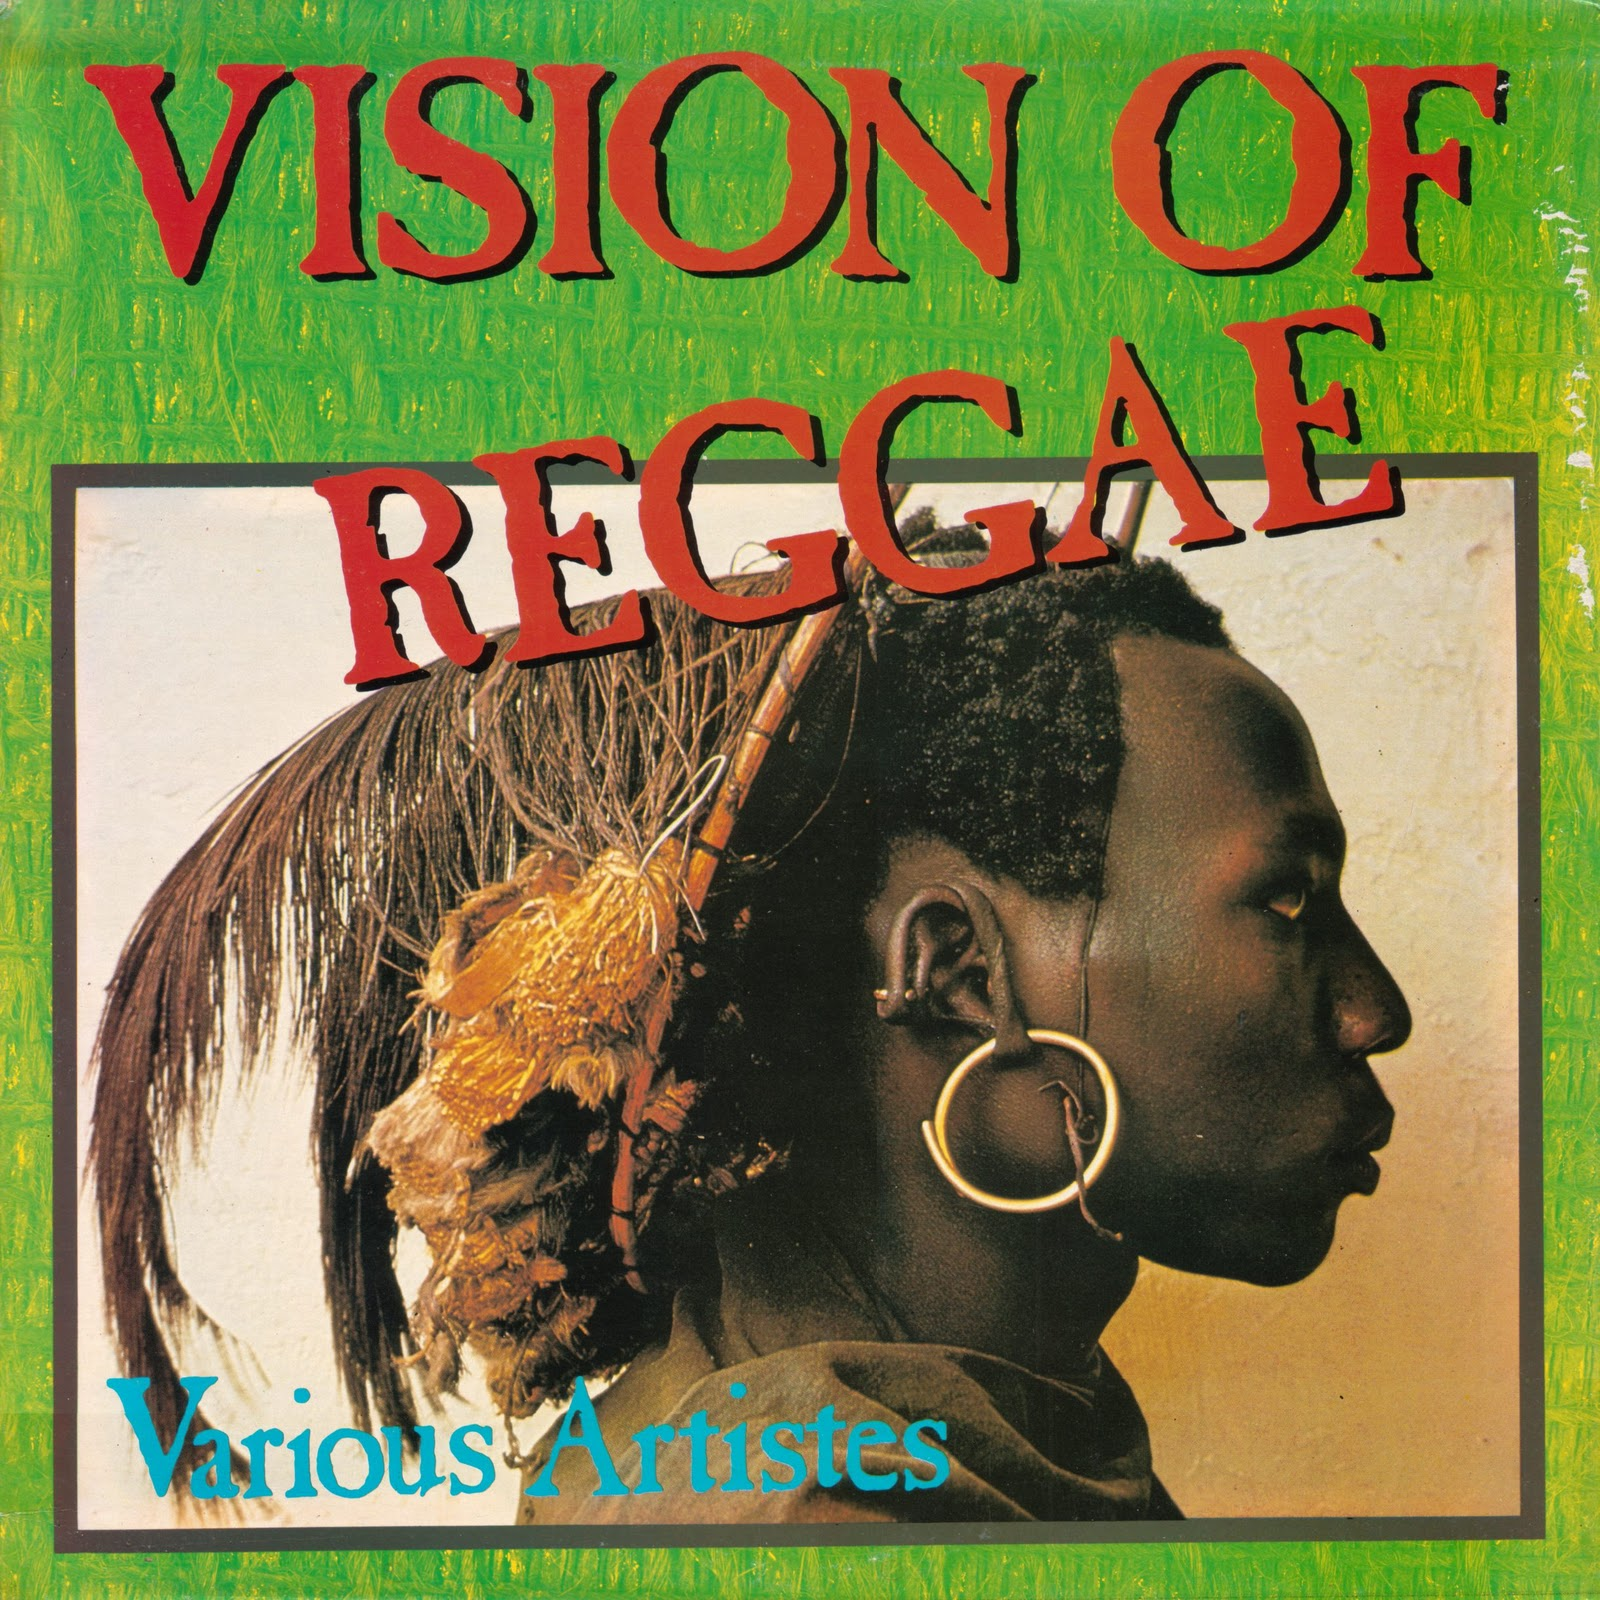 reggaerarities compilations dezembro 2011